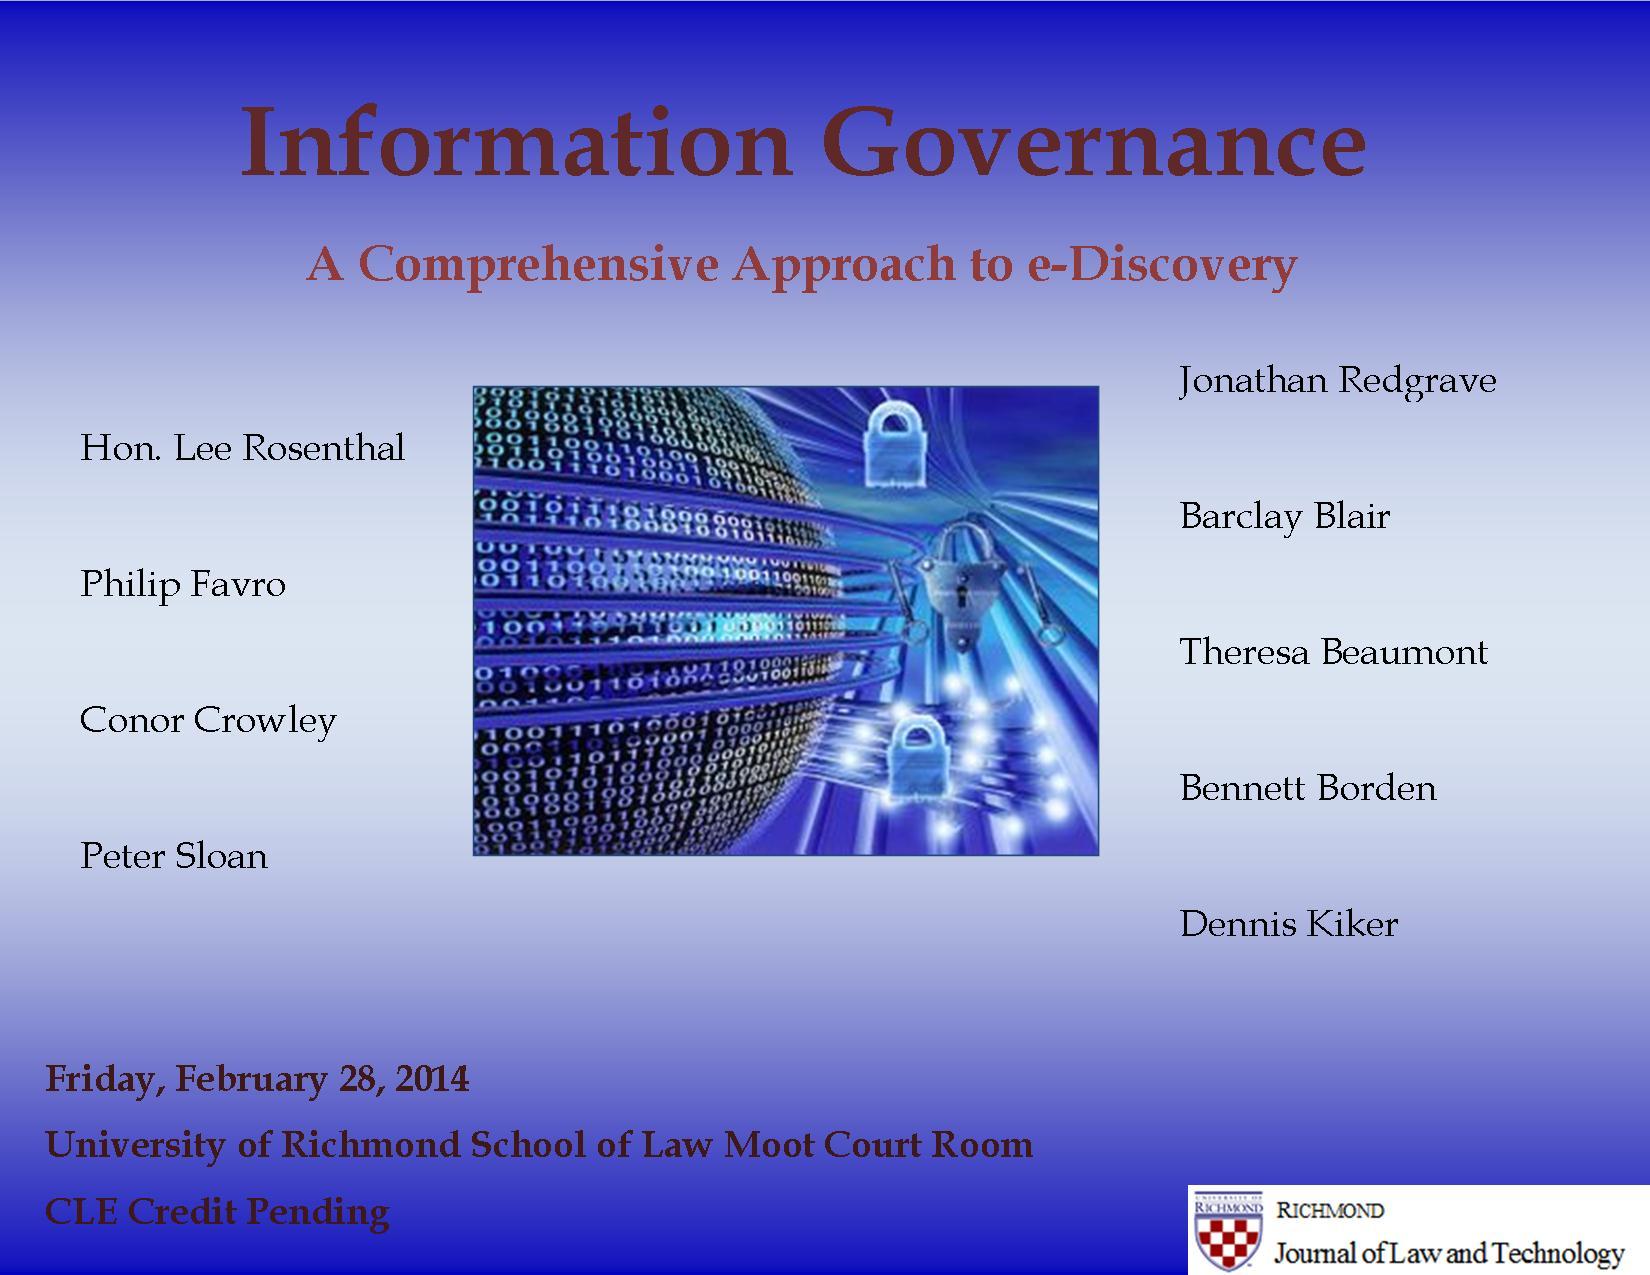 Announcement: Symposium Registration Now Open